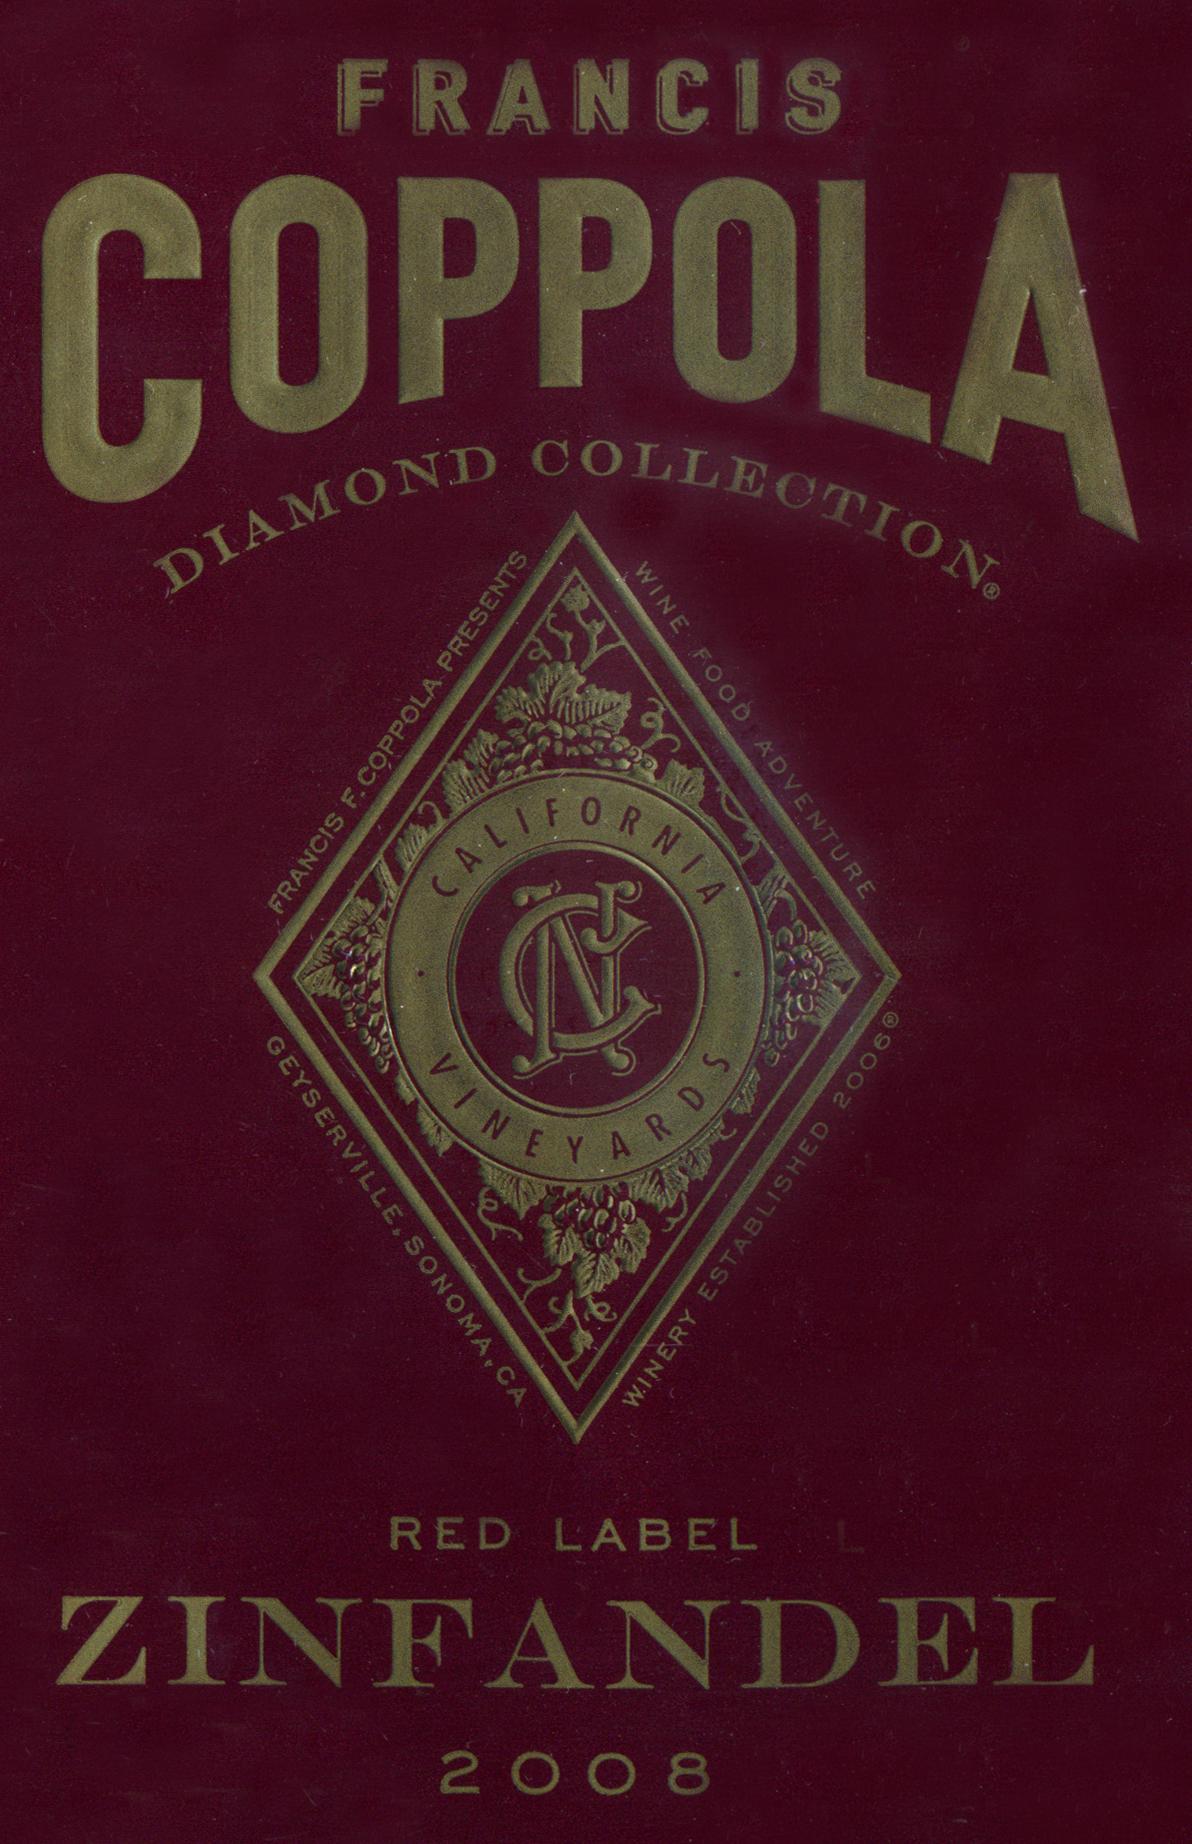 It's just a photo of Wild Coppola Claret 2009 Black Label